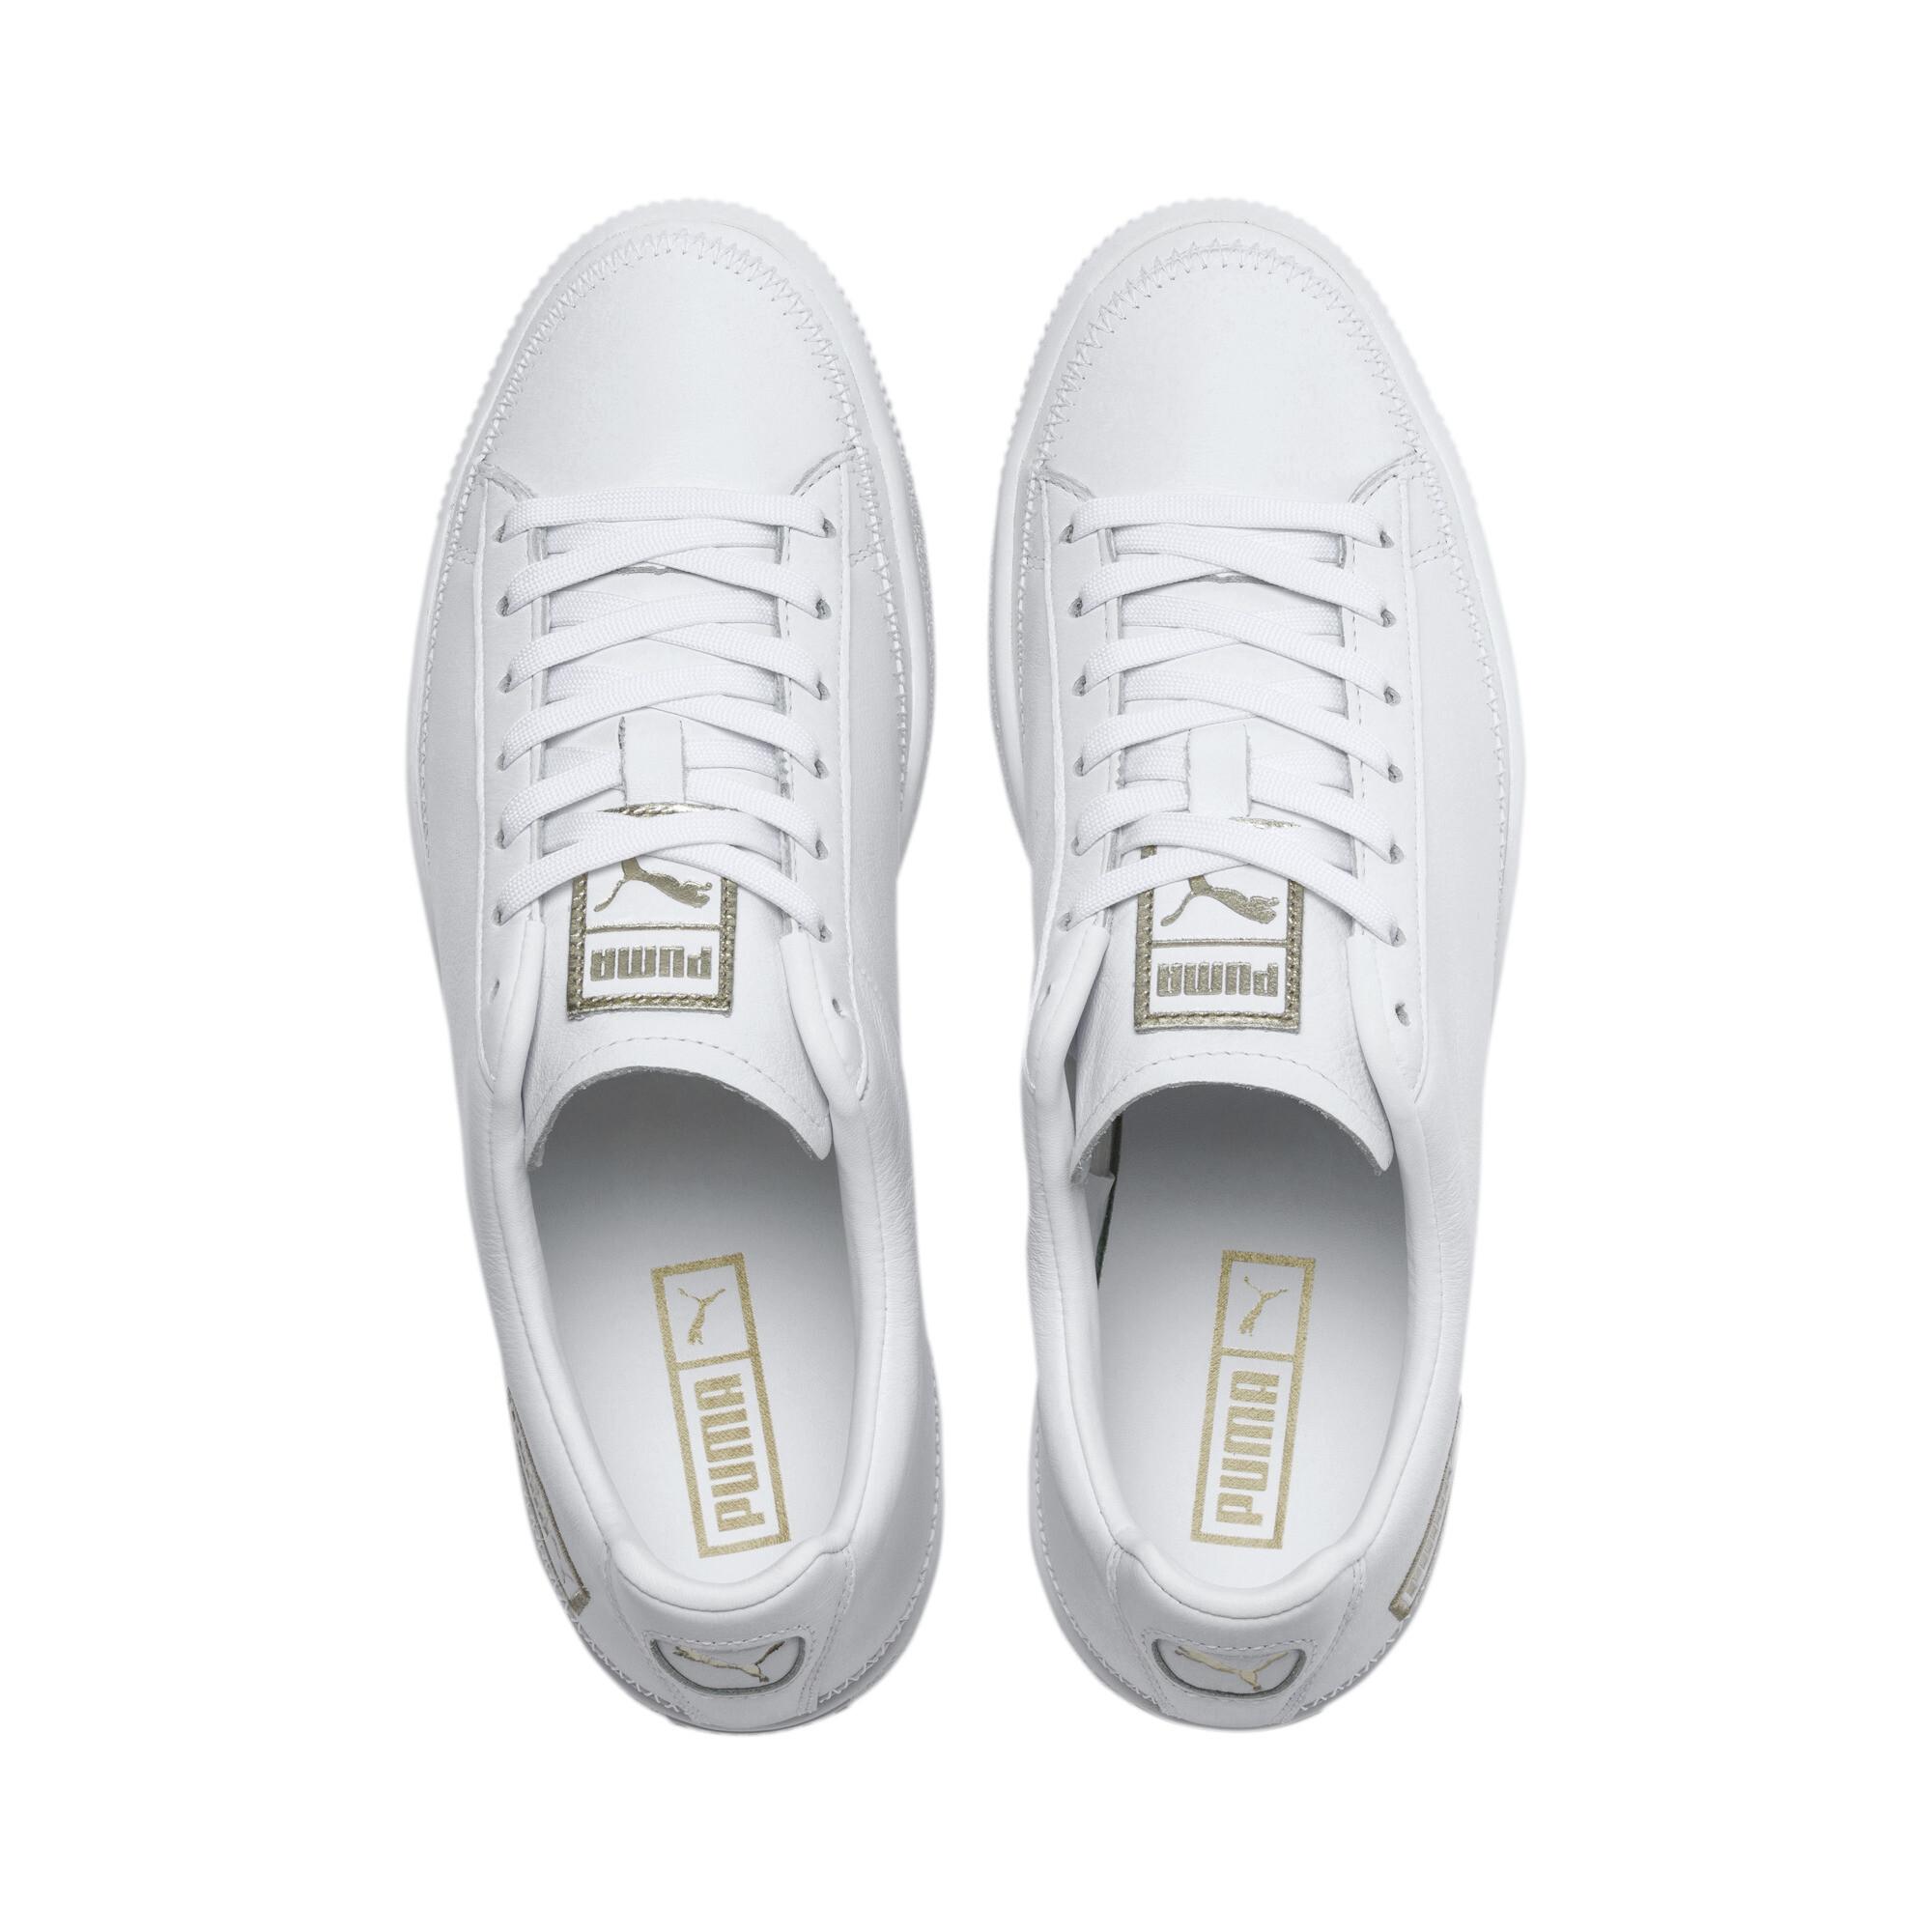 Indexbild 7 - PUMA Basket Stitch Sneaker Unisex Schuhe Neu